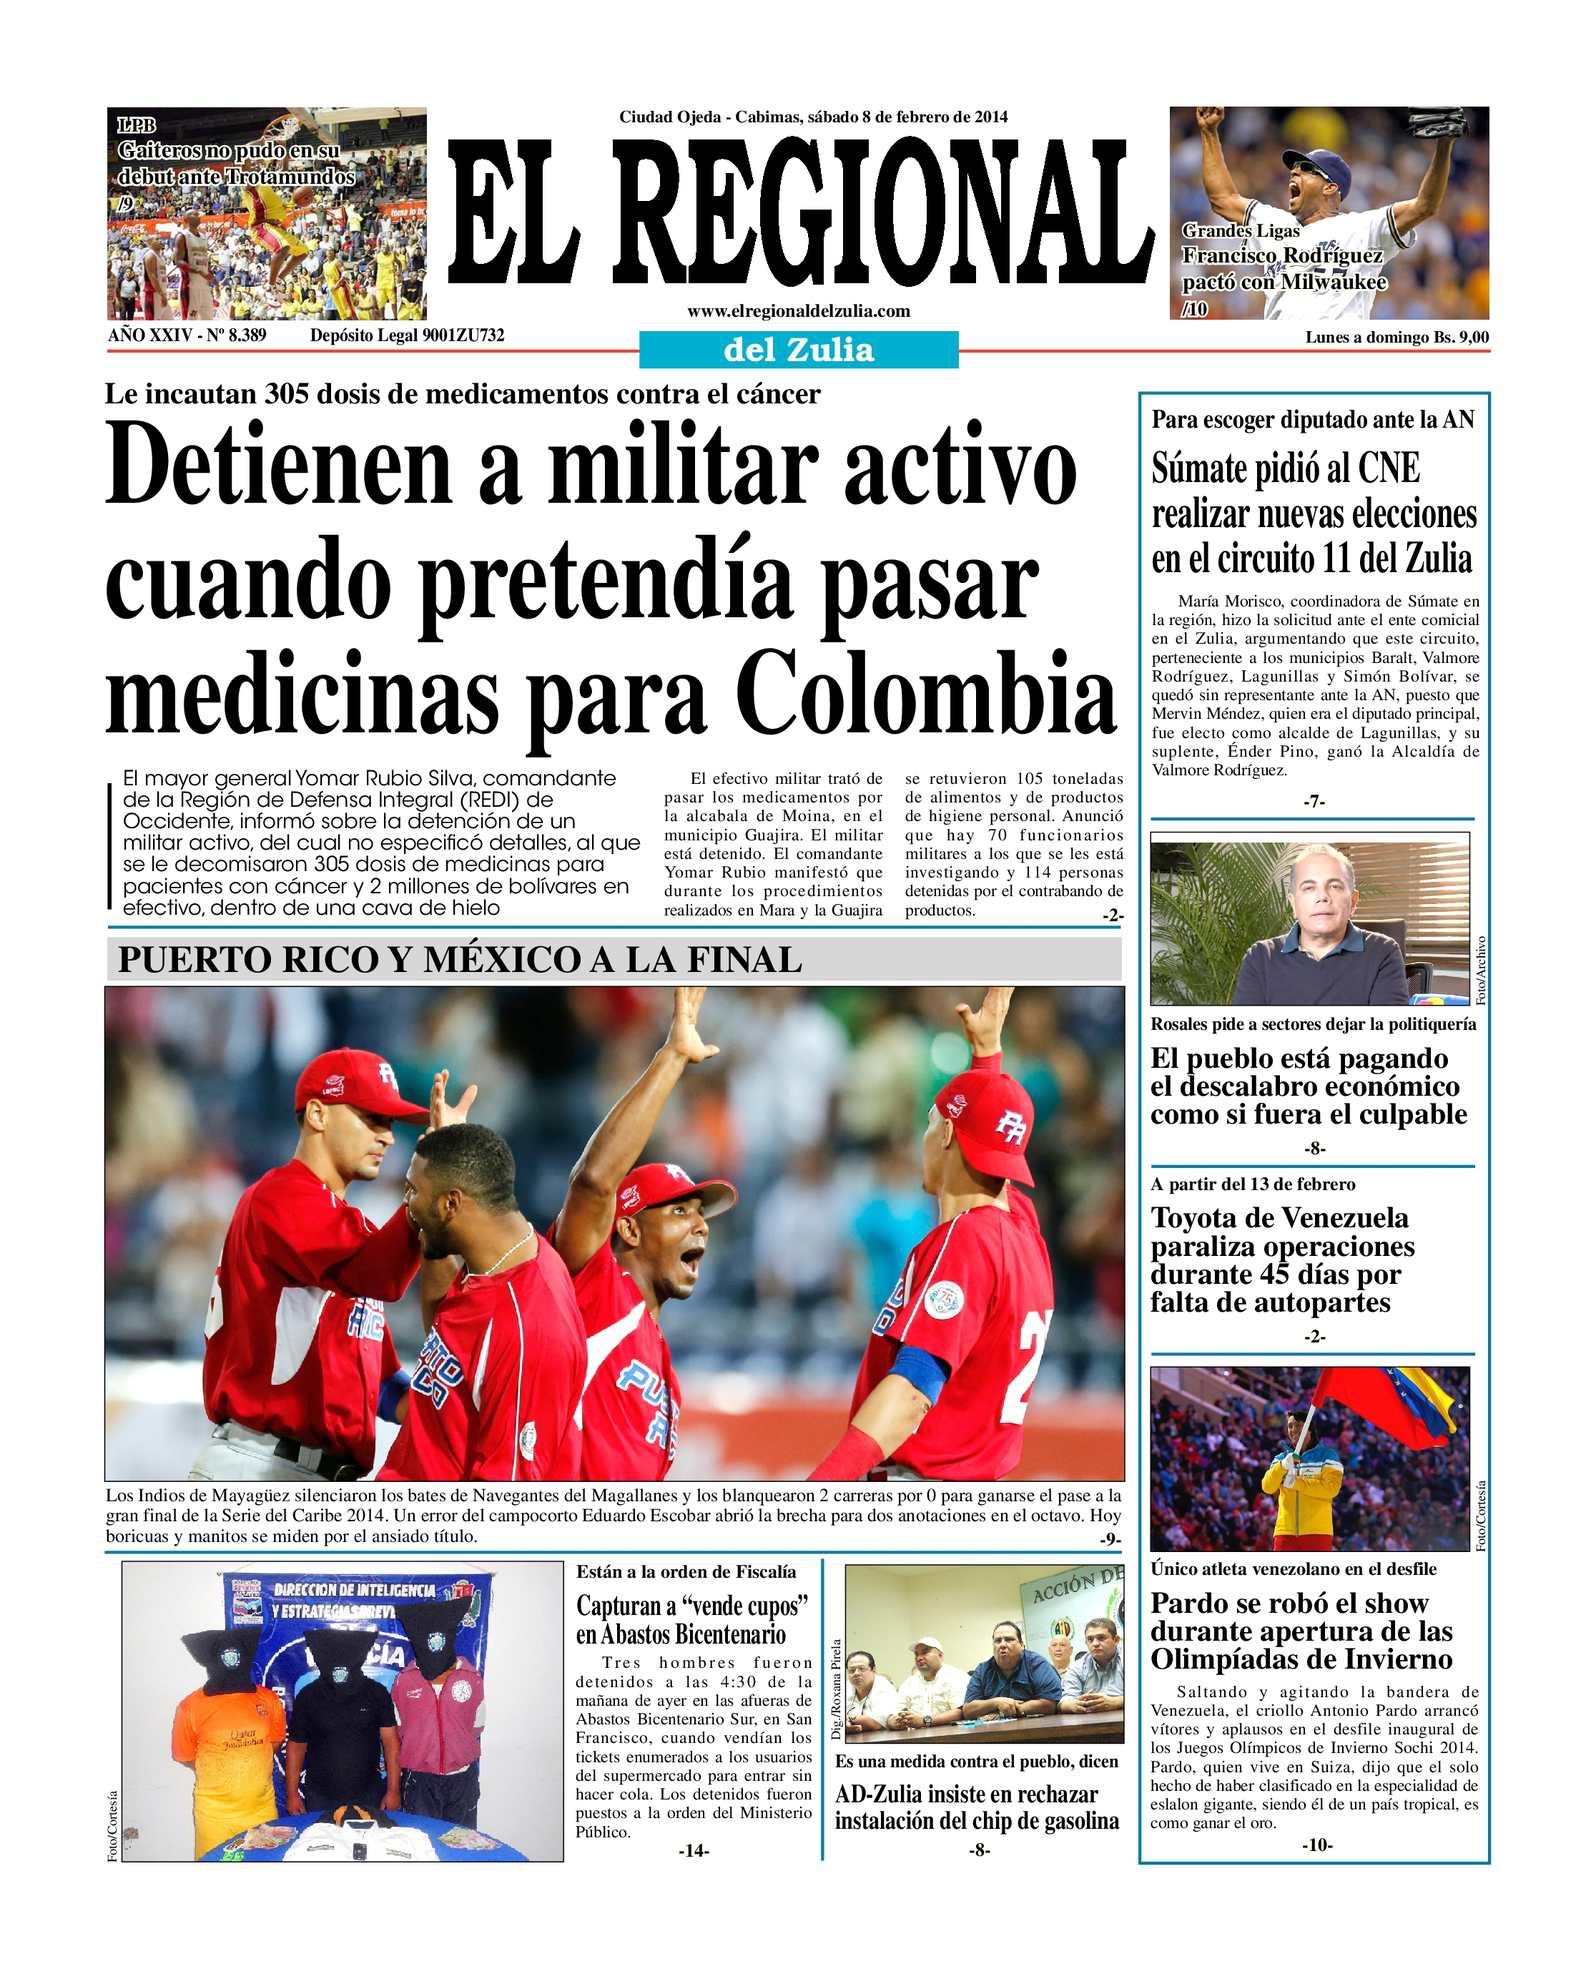 Calaméo - El Regional del Zulia 08-02-2014